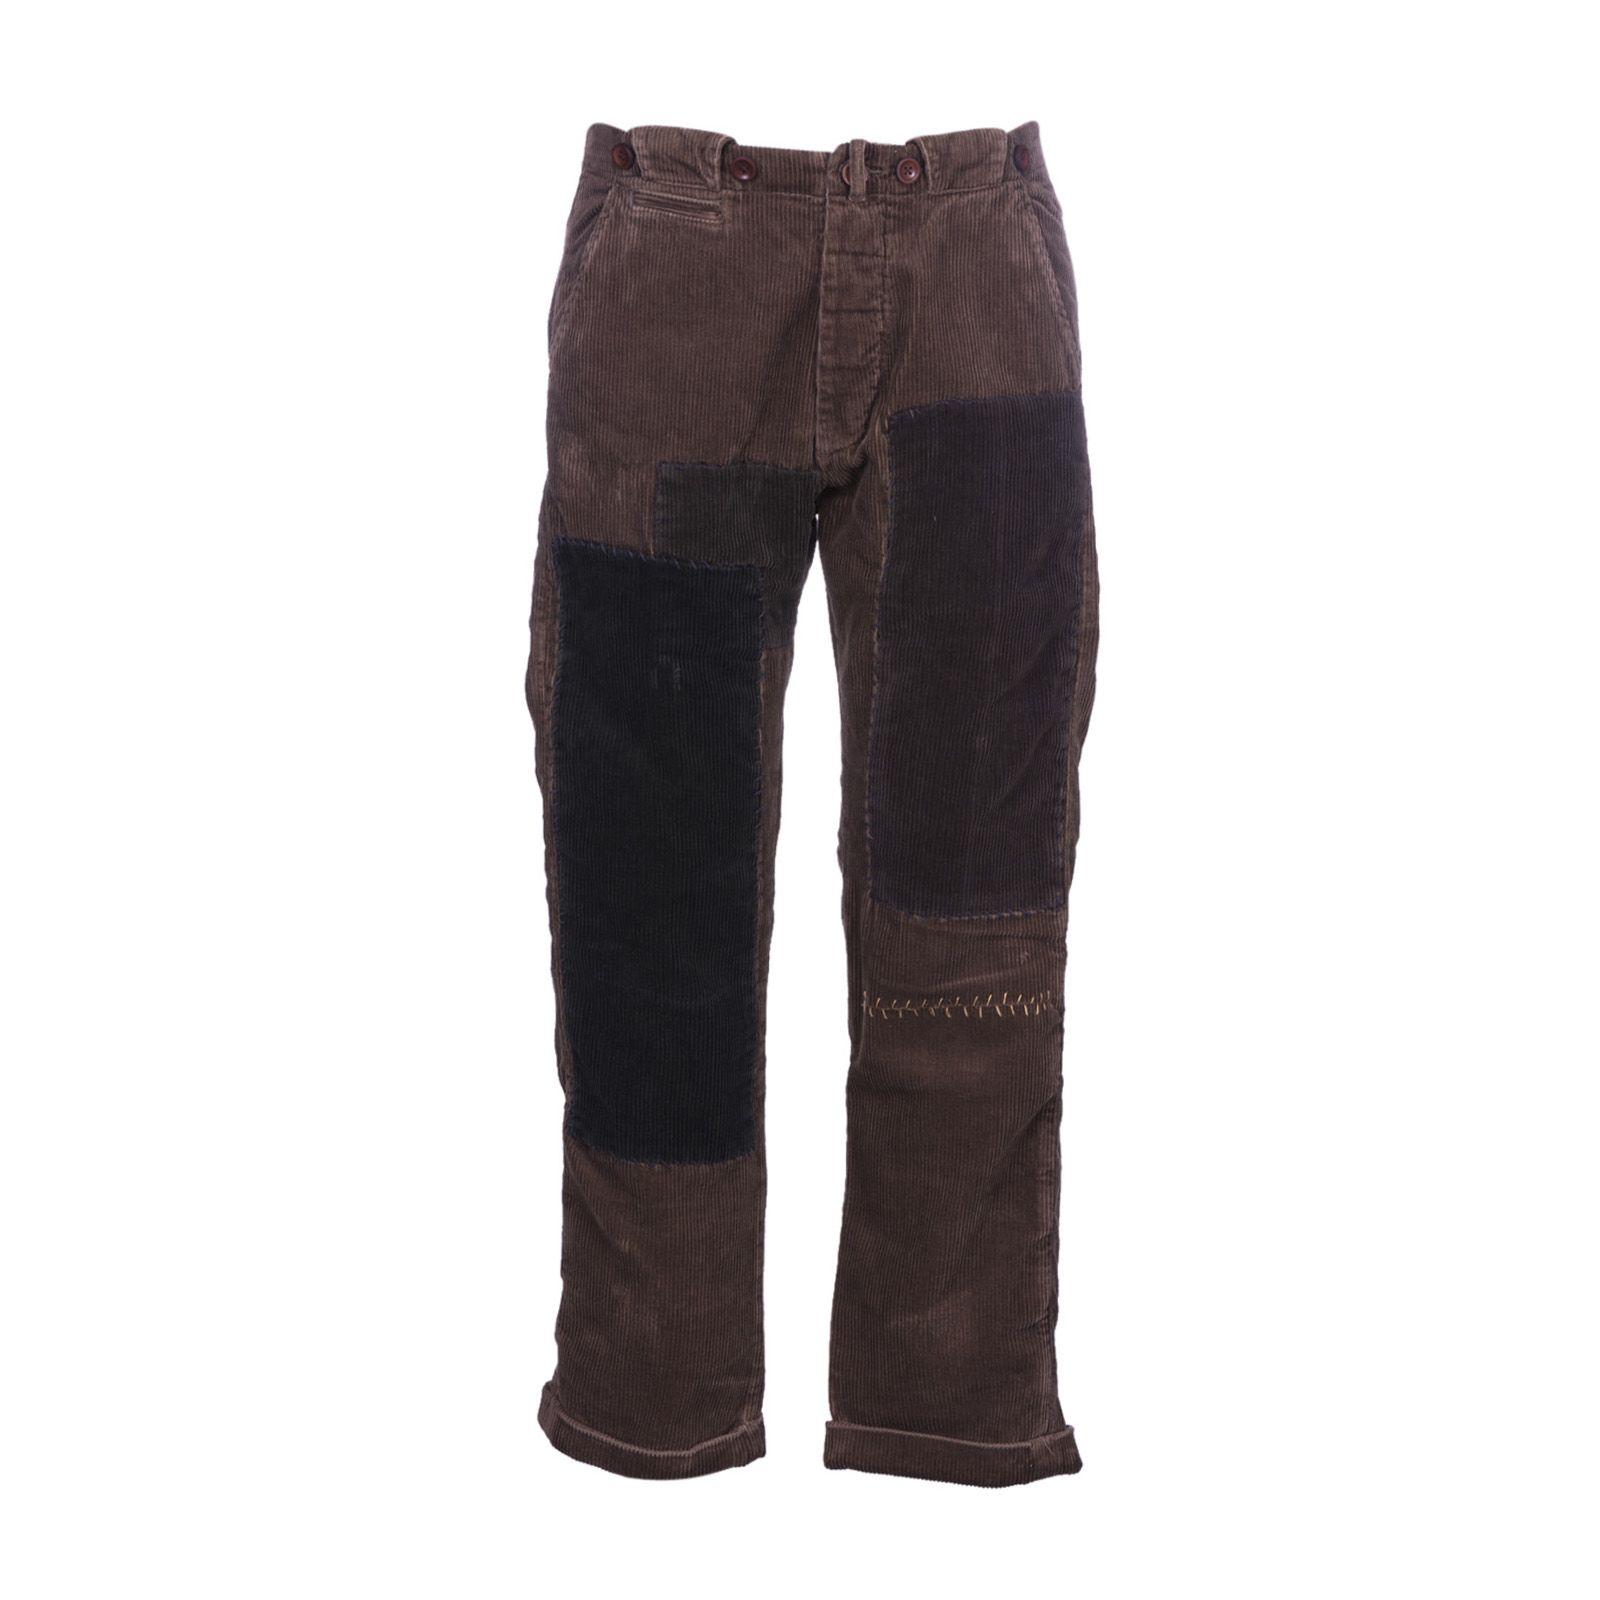 Levis Vintage Clothing Corduroy Patch Trousers